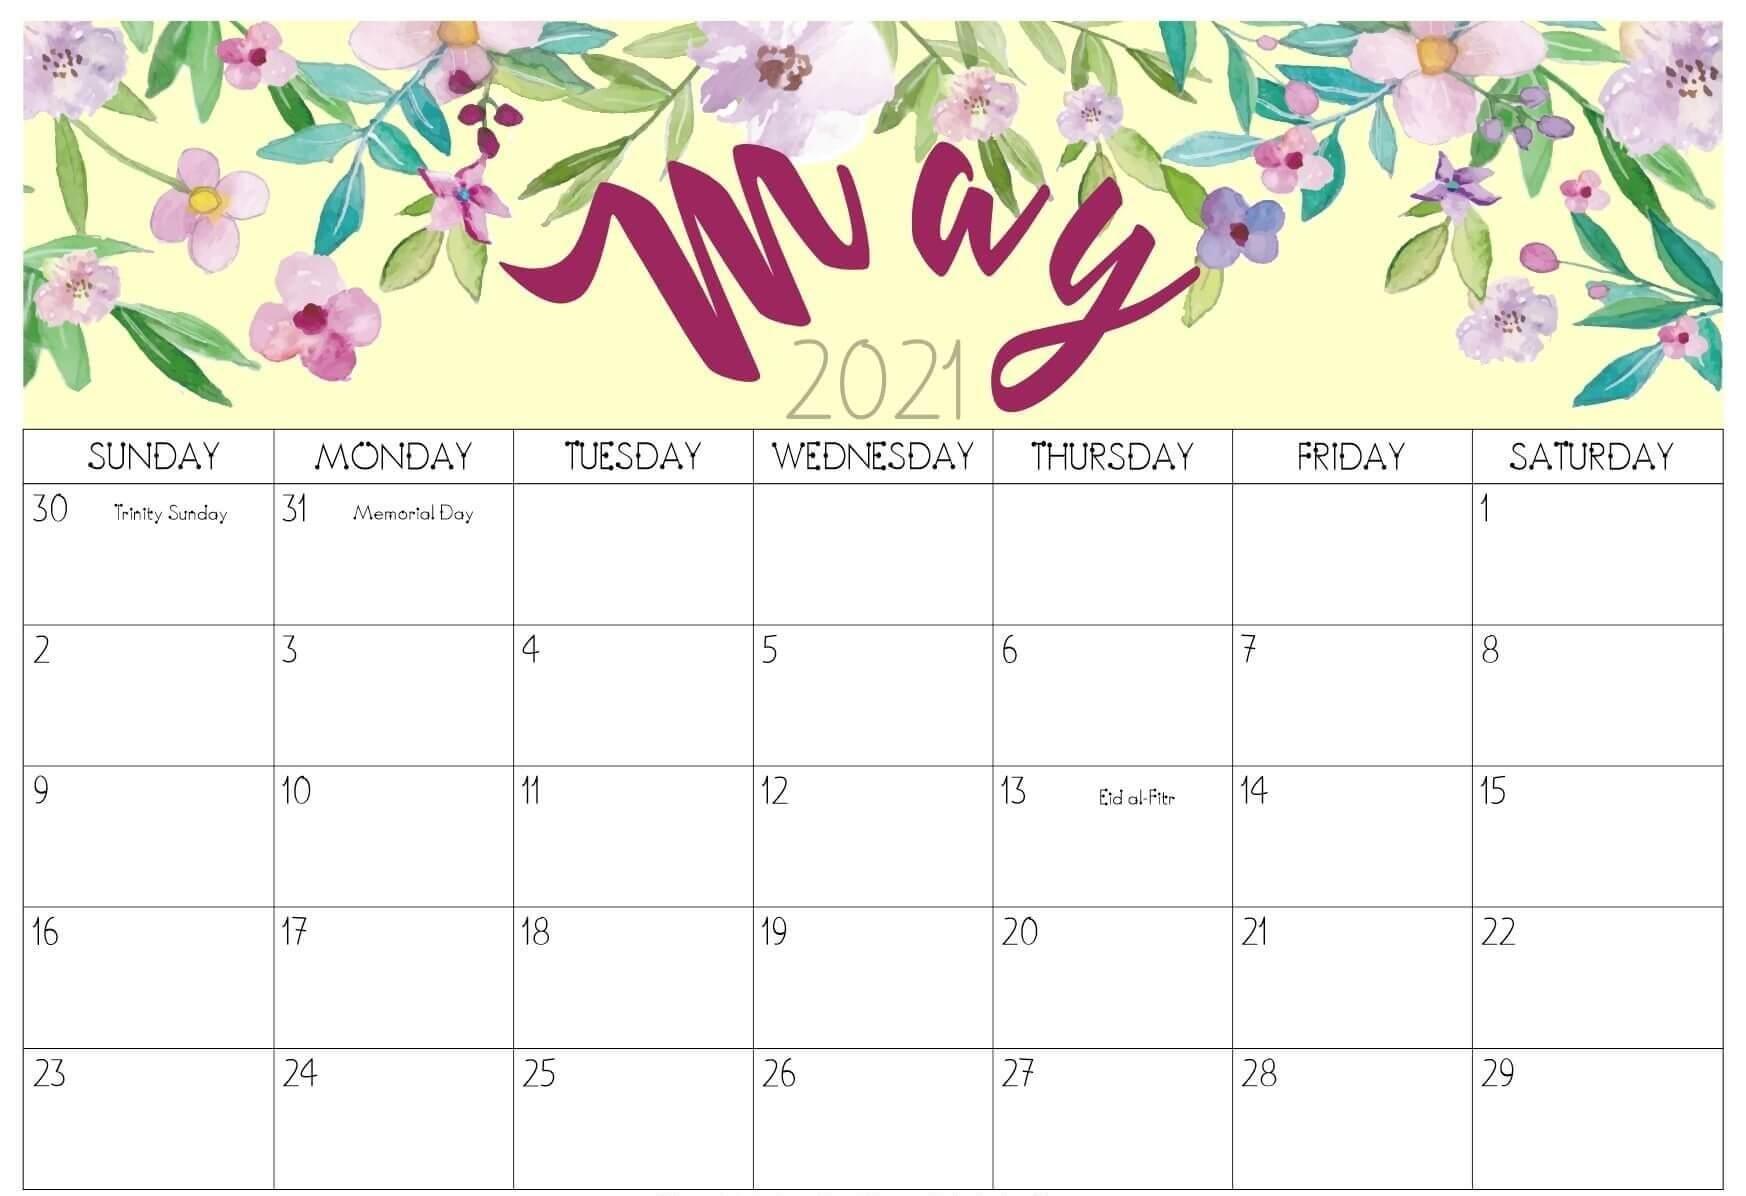 May 2021 Floral Calendar Design